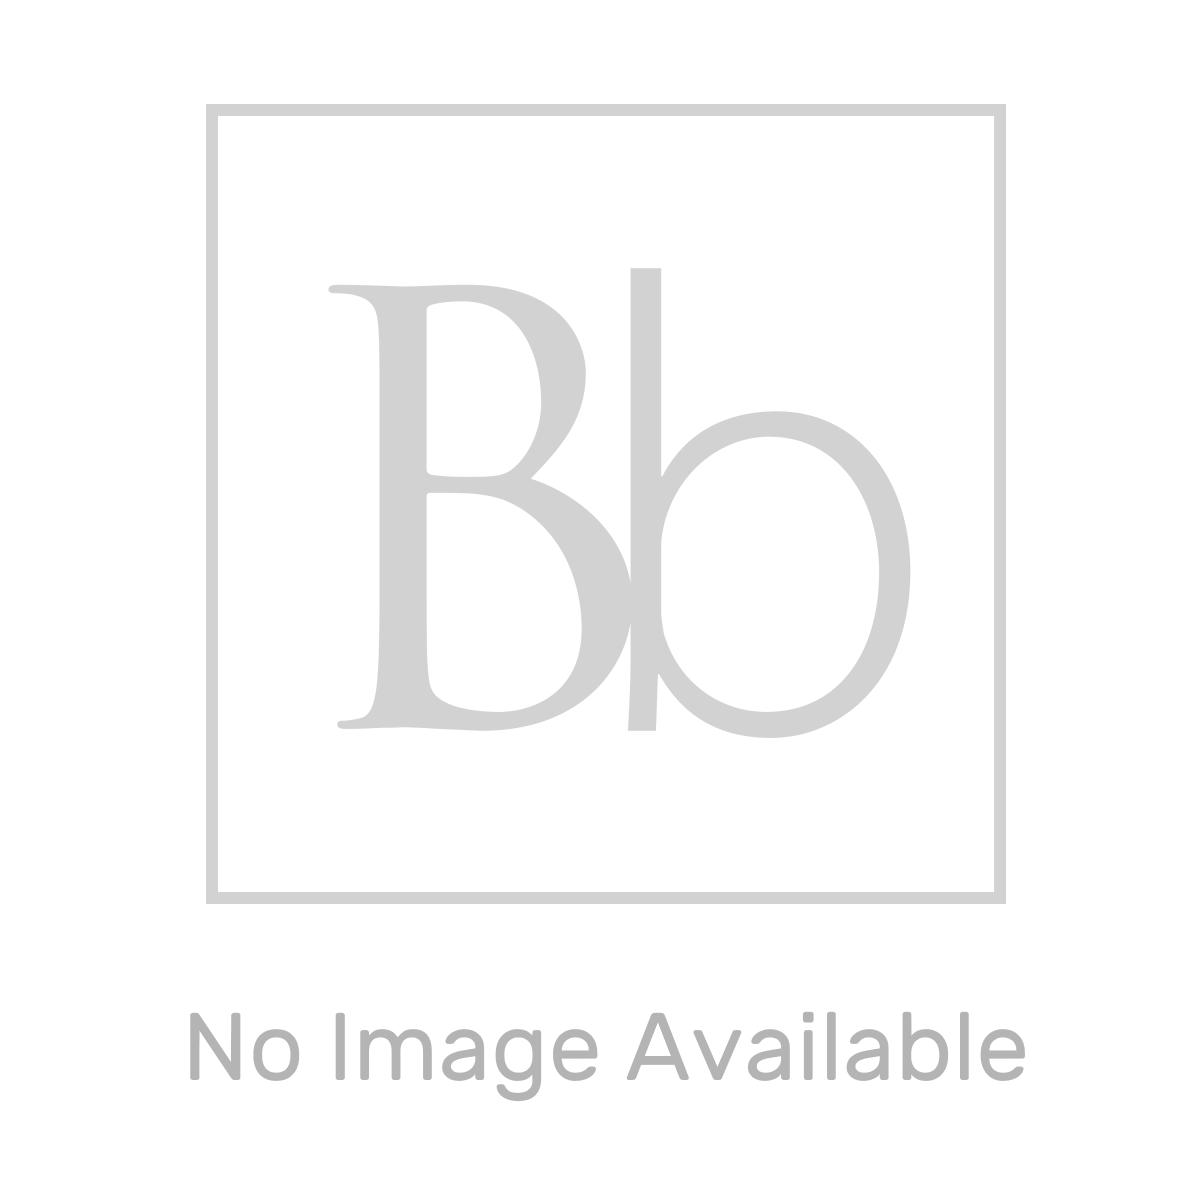 RAK Washington Black Bathroom Mirror 1200mm Measurements